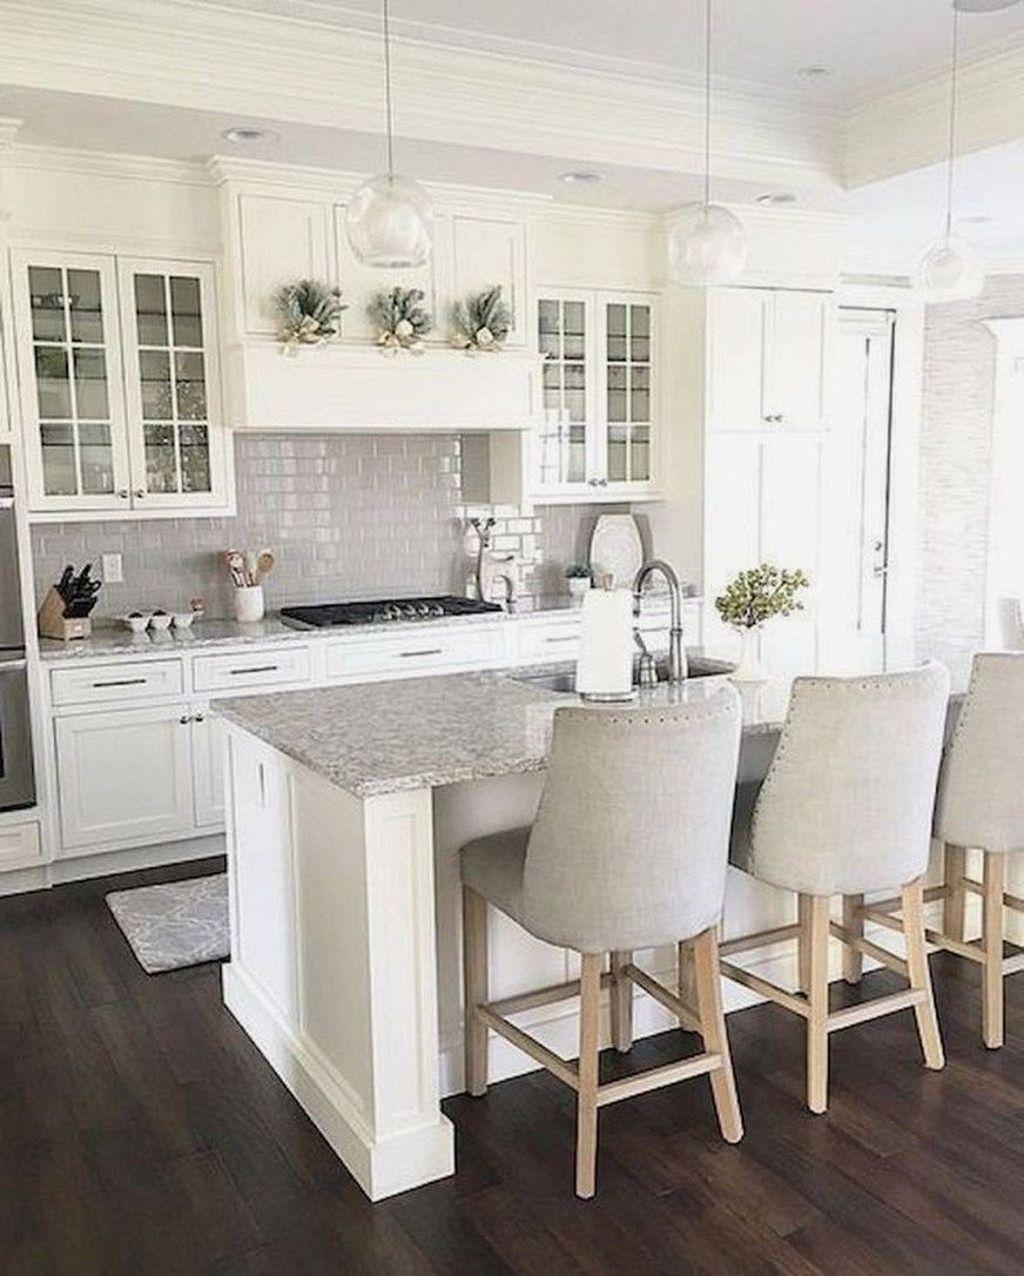 Stunning Glass Backsplash Kitchen Ideas 24